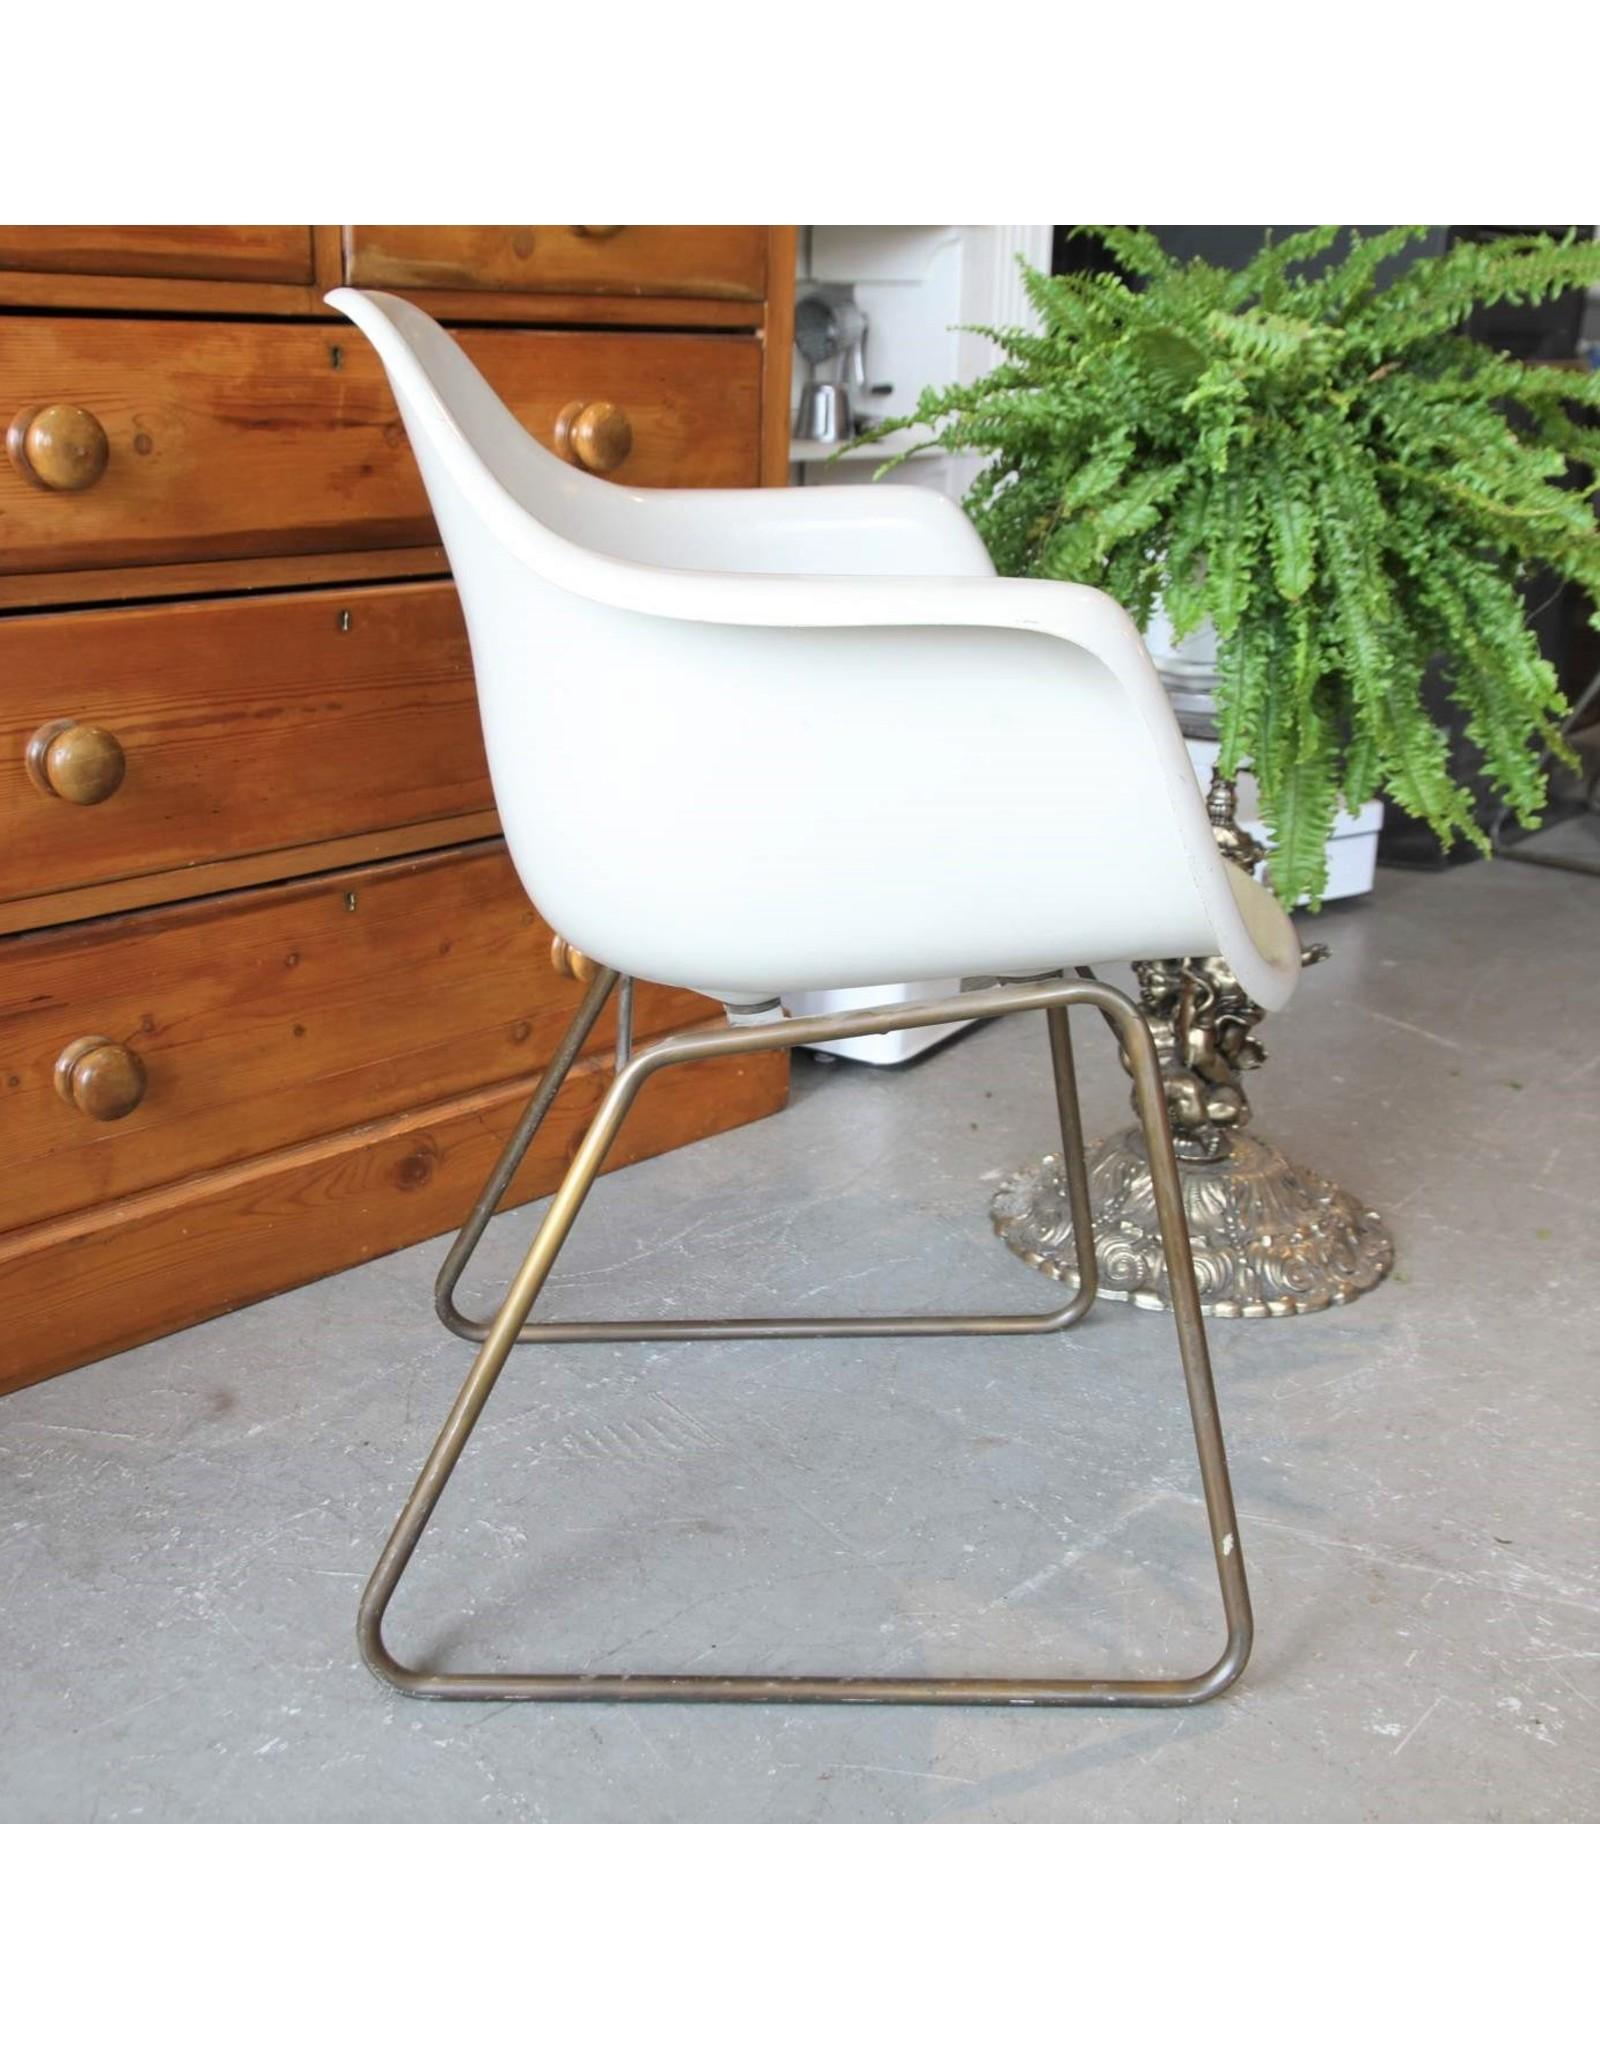 Chair - white fiberglass tub chair Krueger Metal Products Green Bay Wisconsin